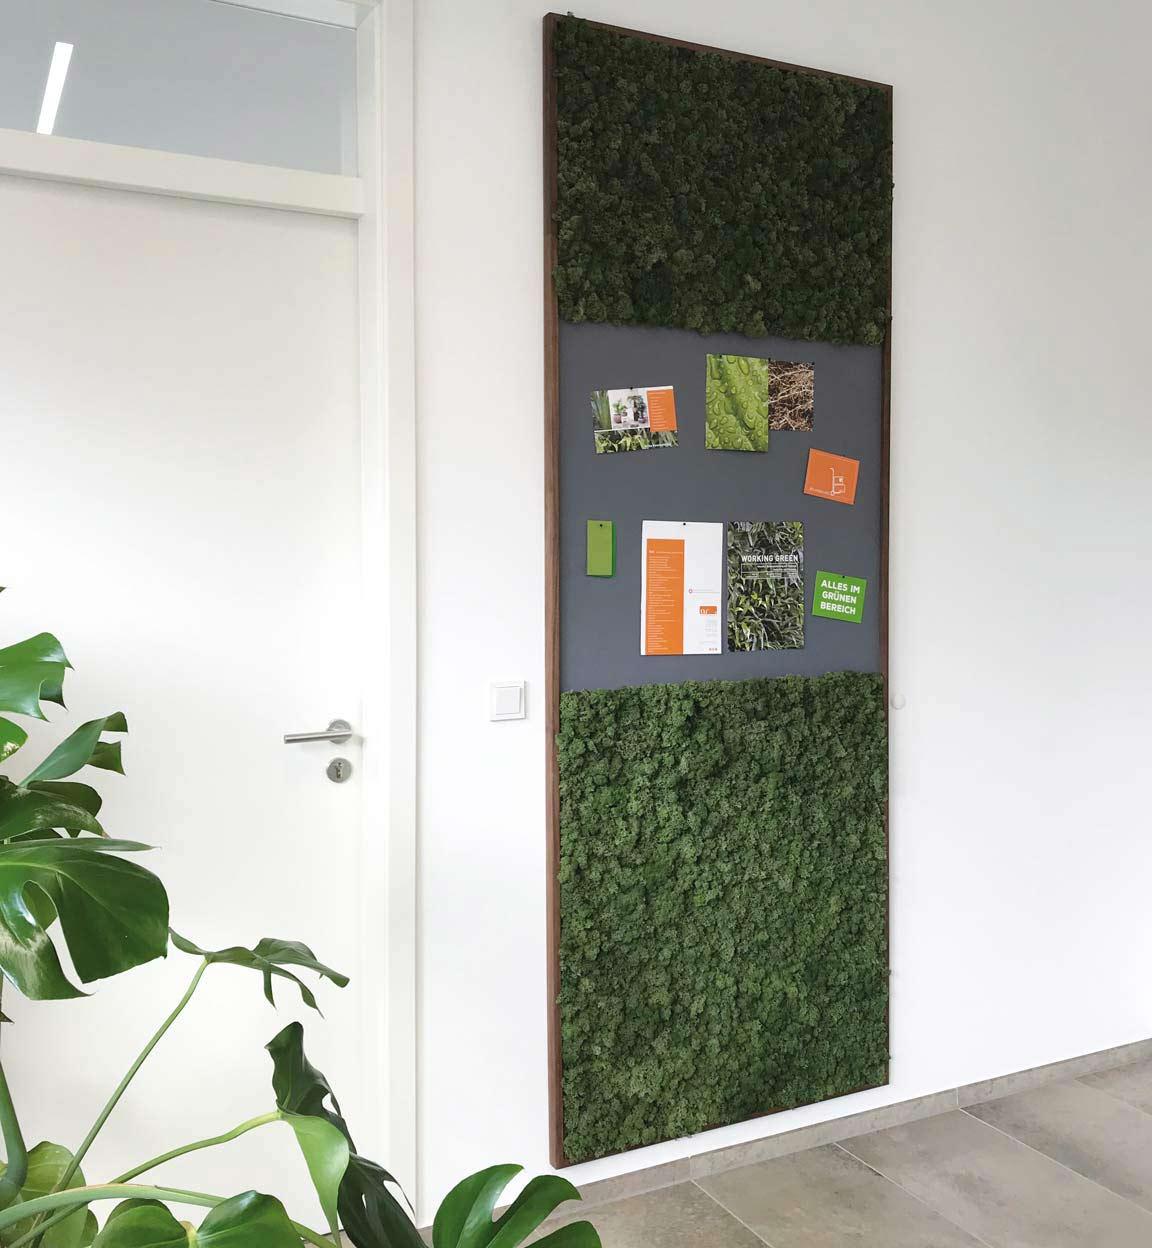 Islandmoos Raumakustik Grüne Wand, akzente raumbegrünung